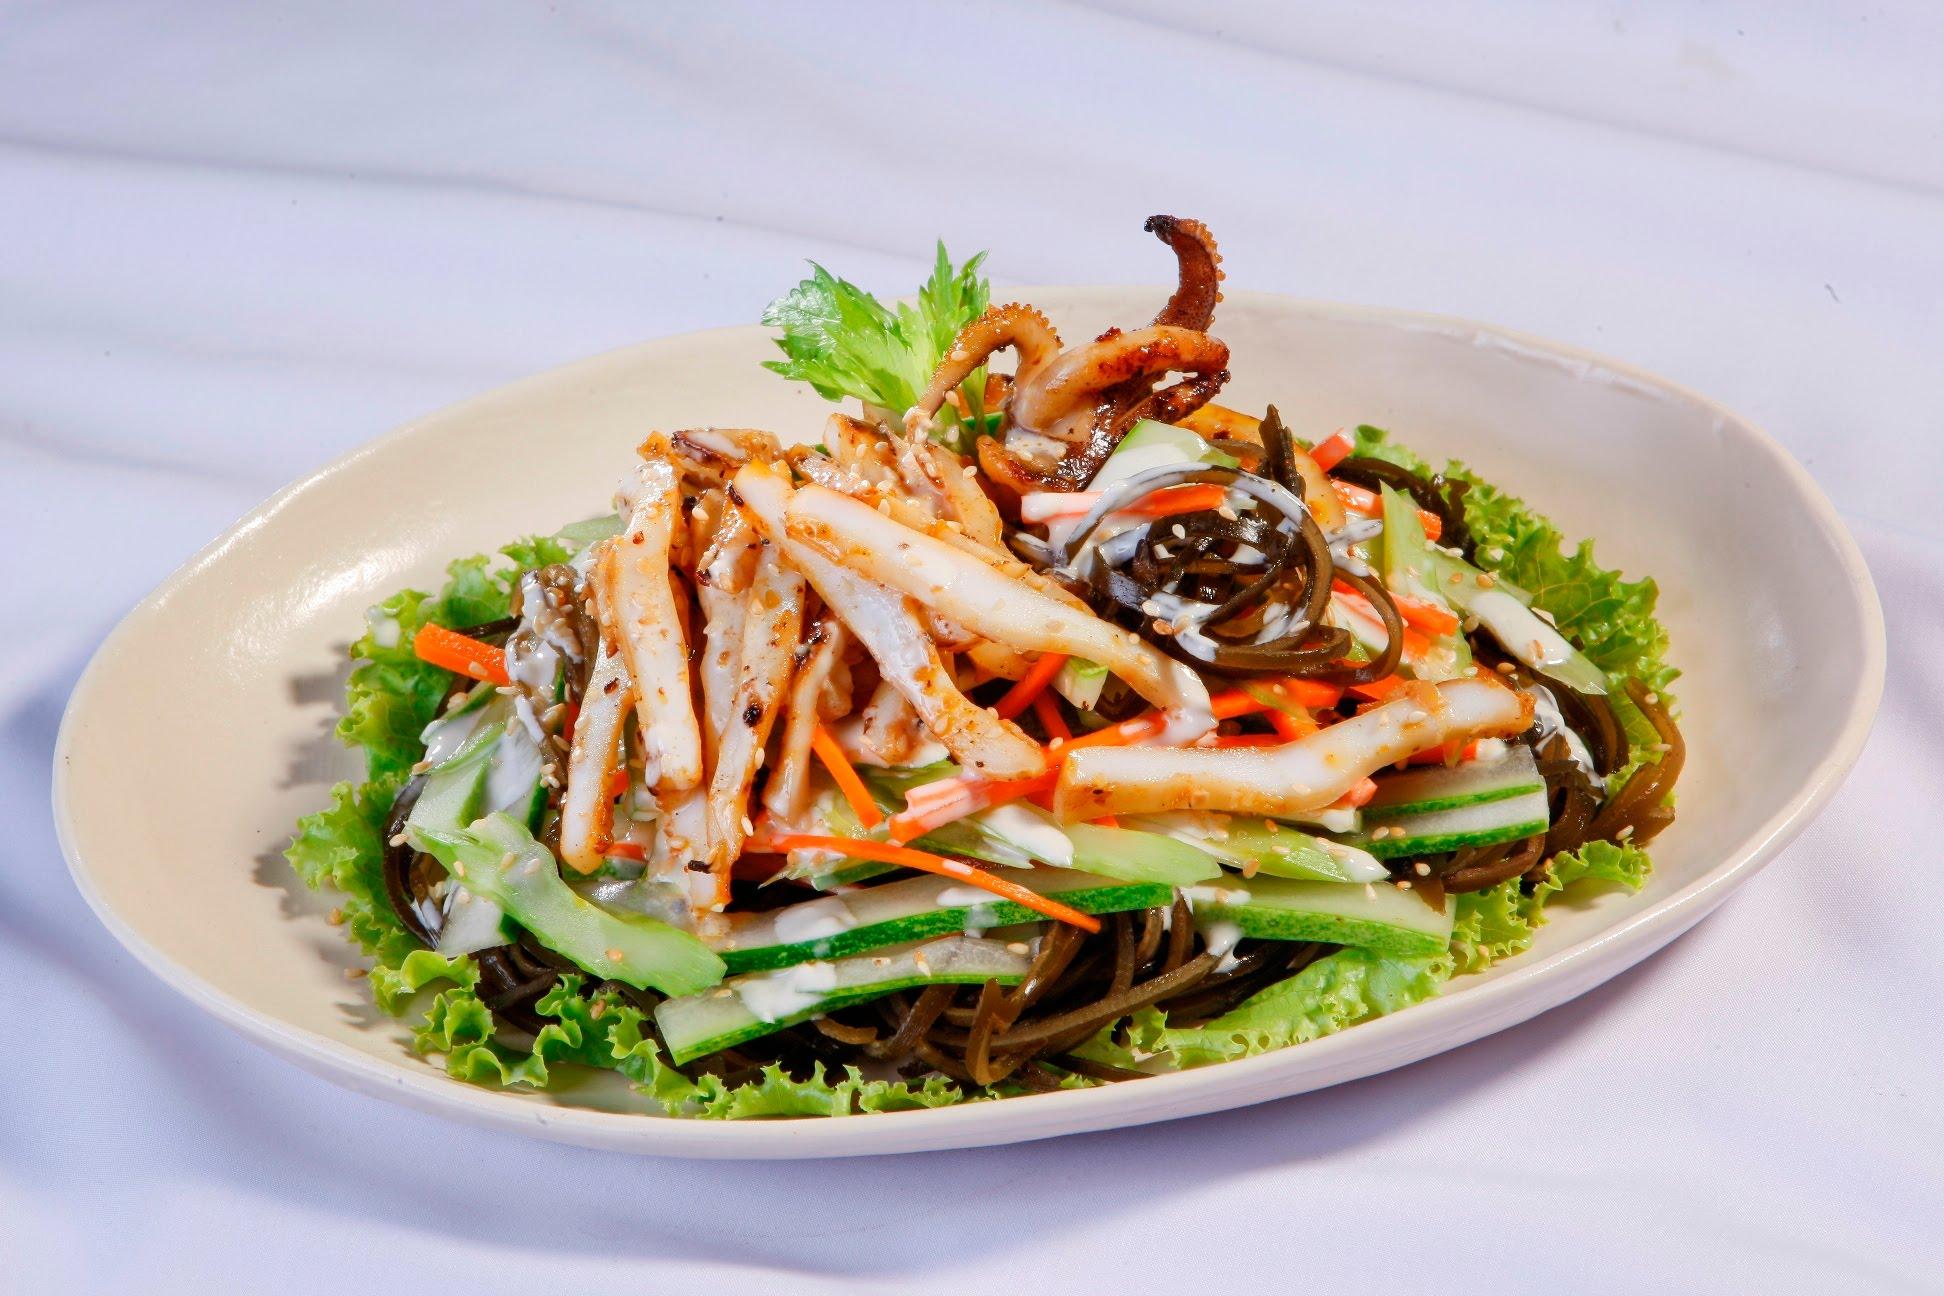 Salad mực phổ tai cực kỳ ngon miệng